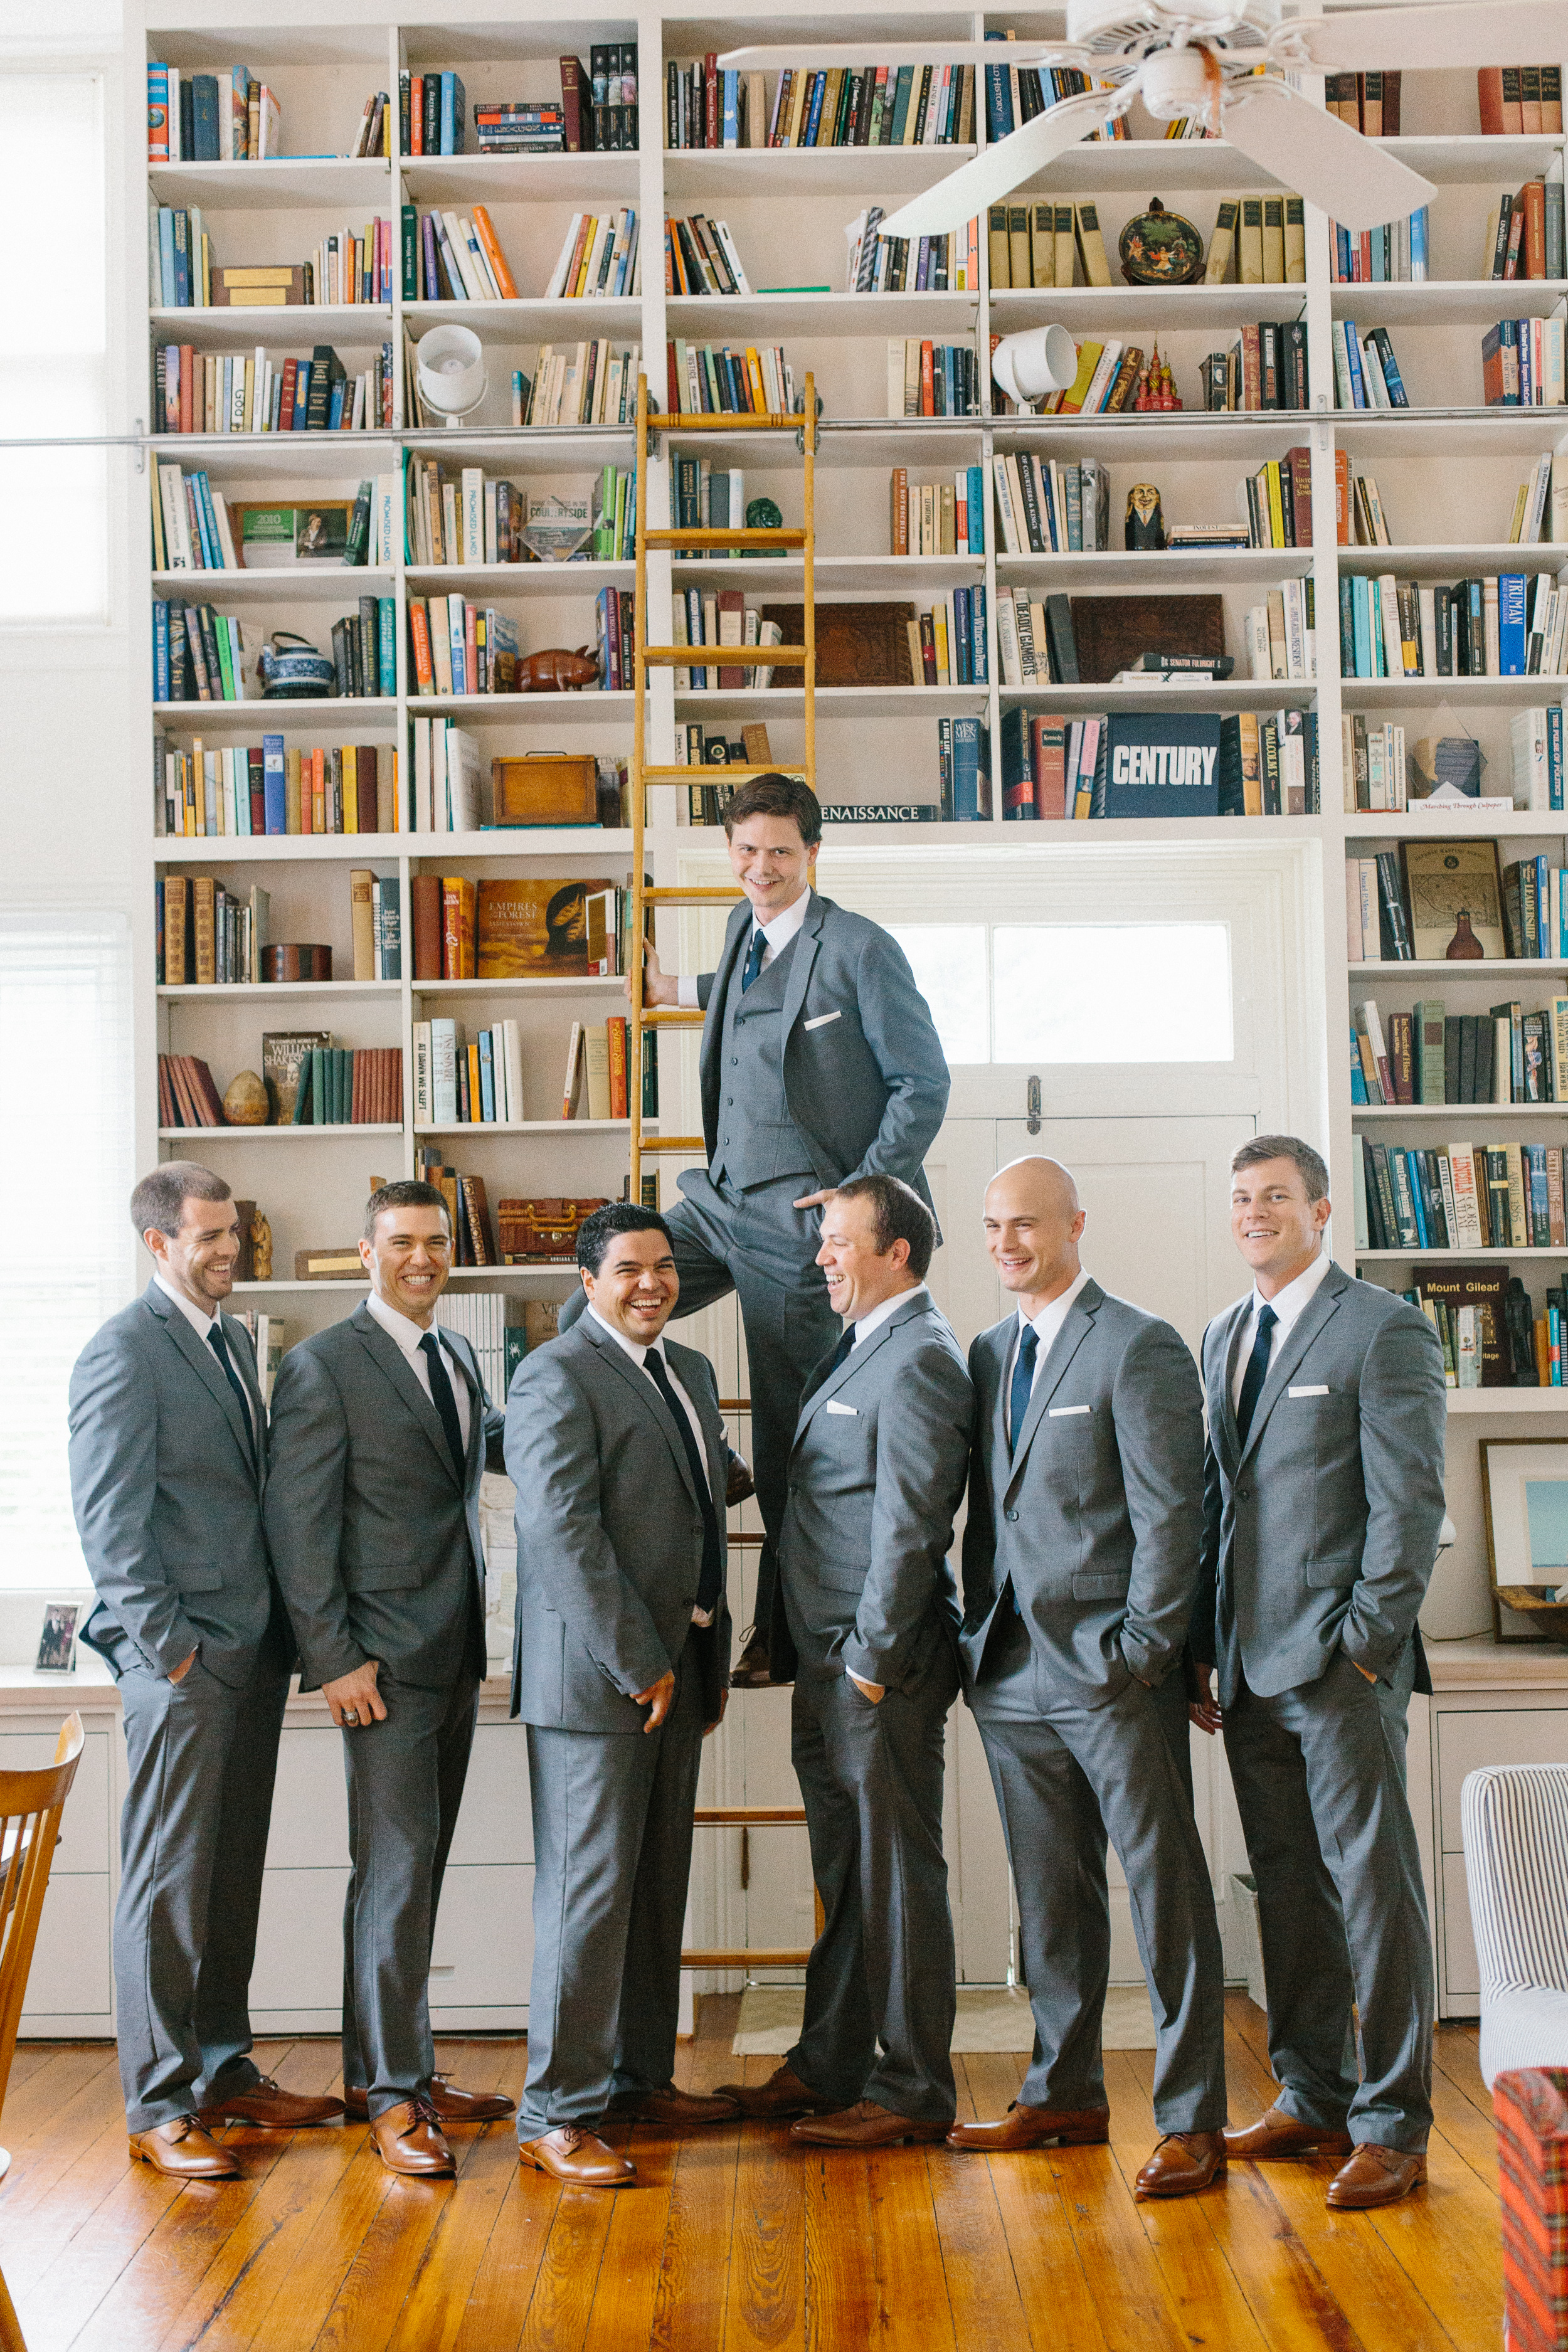 groomsmen-group-photo-wall-of-books